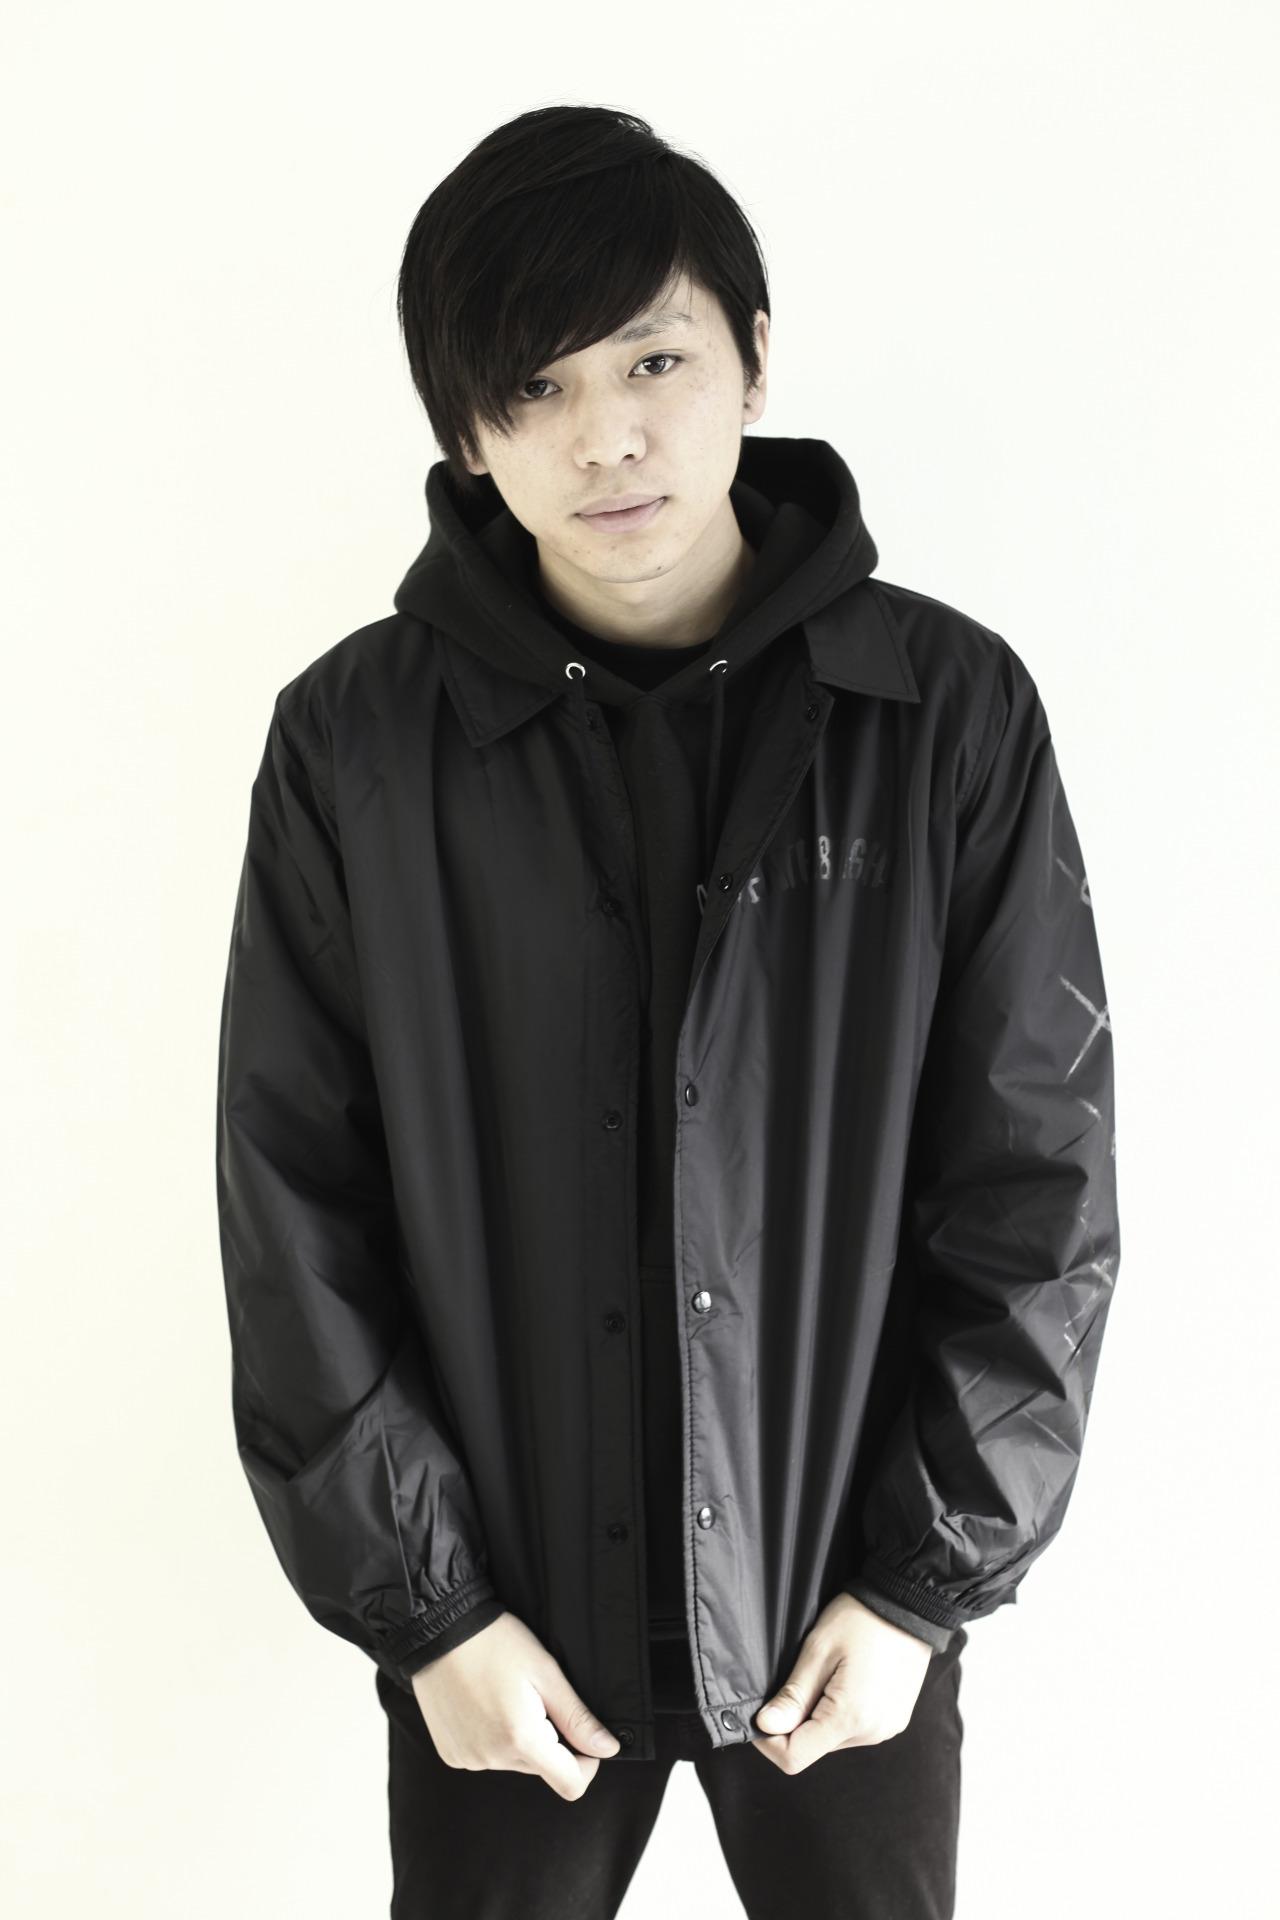 deathsight C JKT / BLACK x BLACK - 画像3